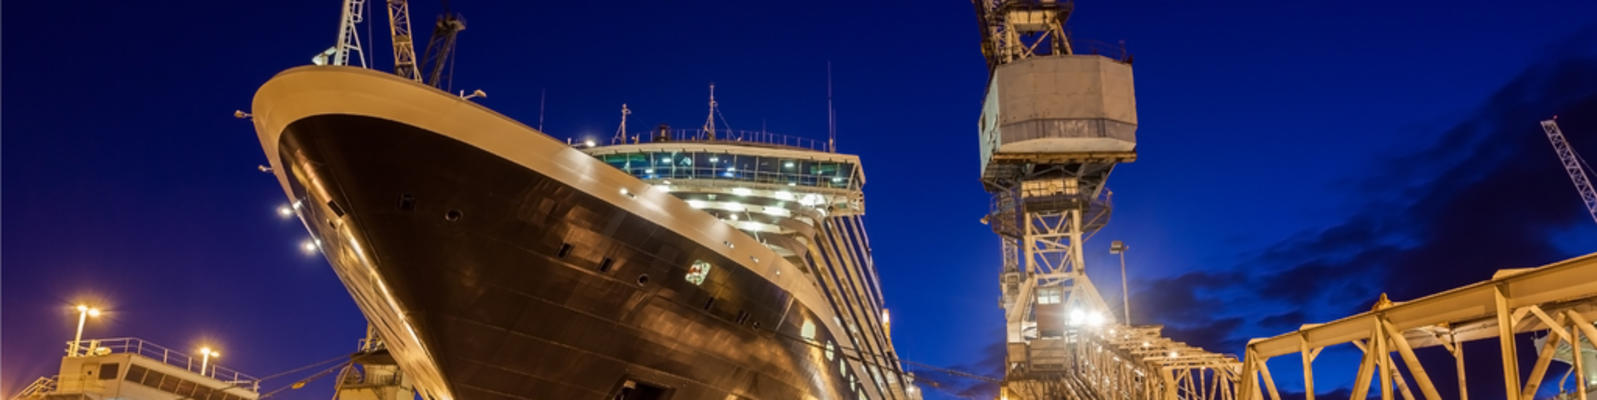 Upcoming Cruise Ship Refurbishments (ID: 521) (Photo: Sorin Colac/Shutterstock)